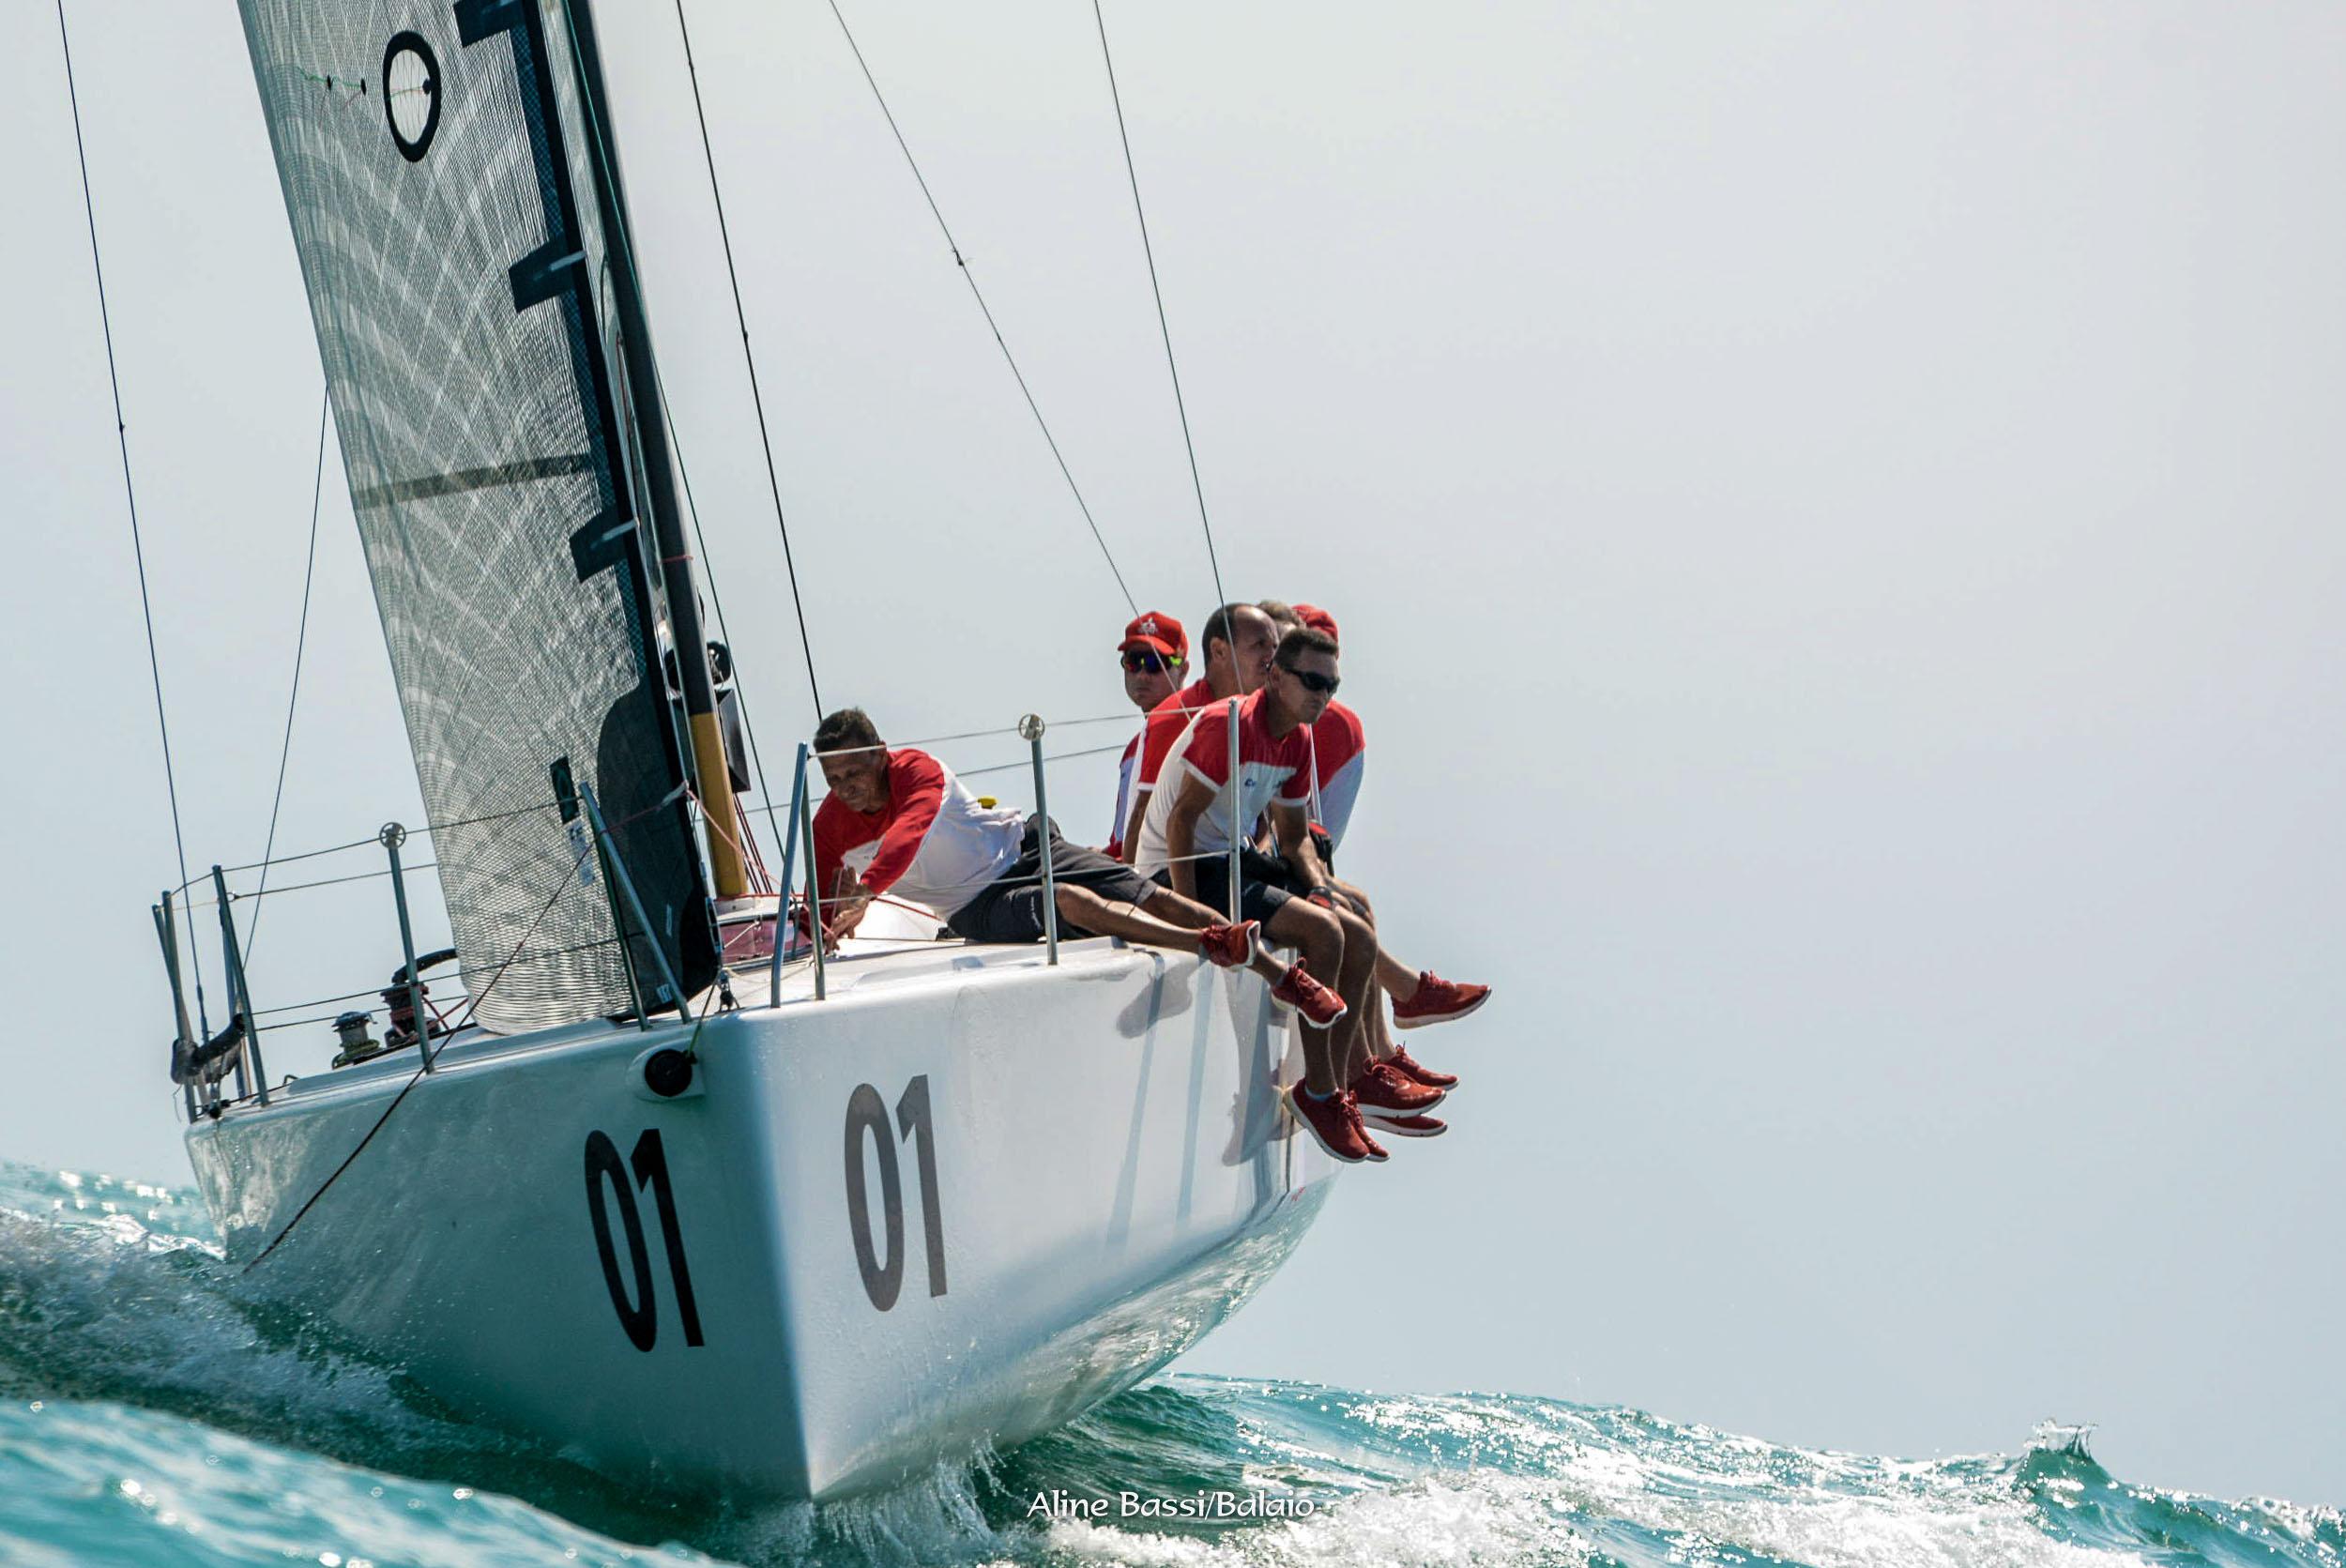 Classe C30 Caballo Loco (Aline Bassi Balaio de Ideias) - boat shopping